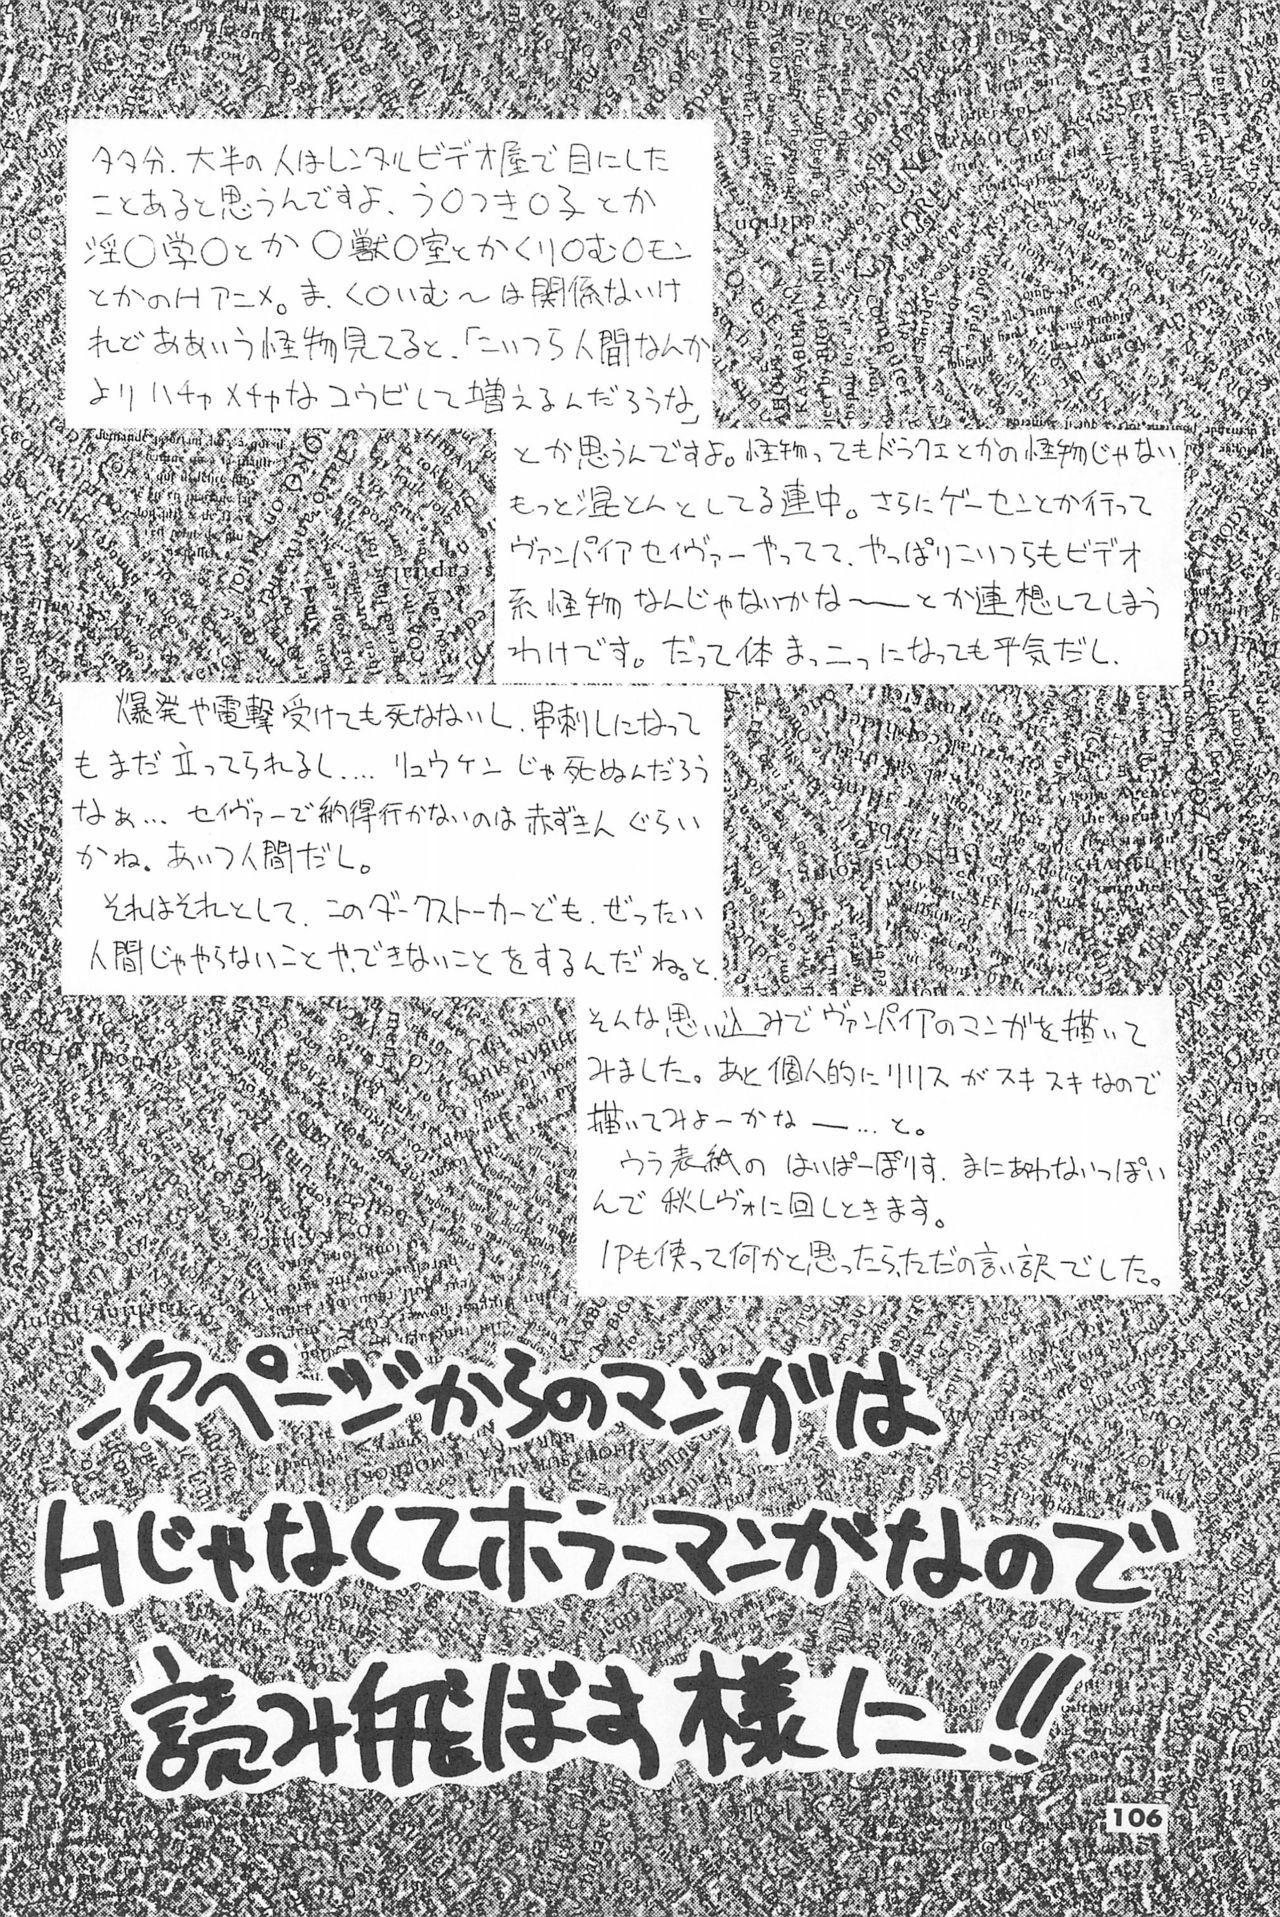 ASTRA NOAT 2 107